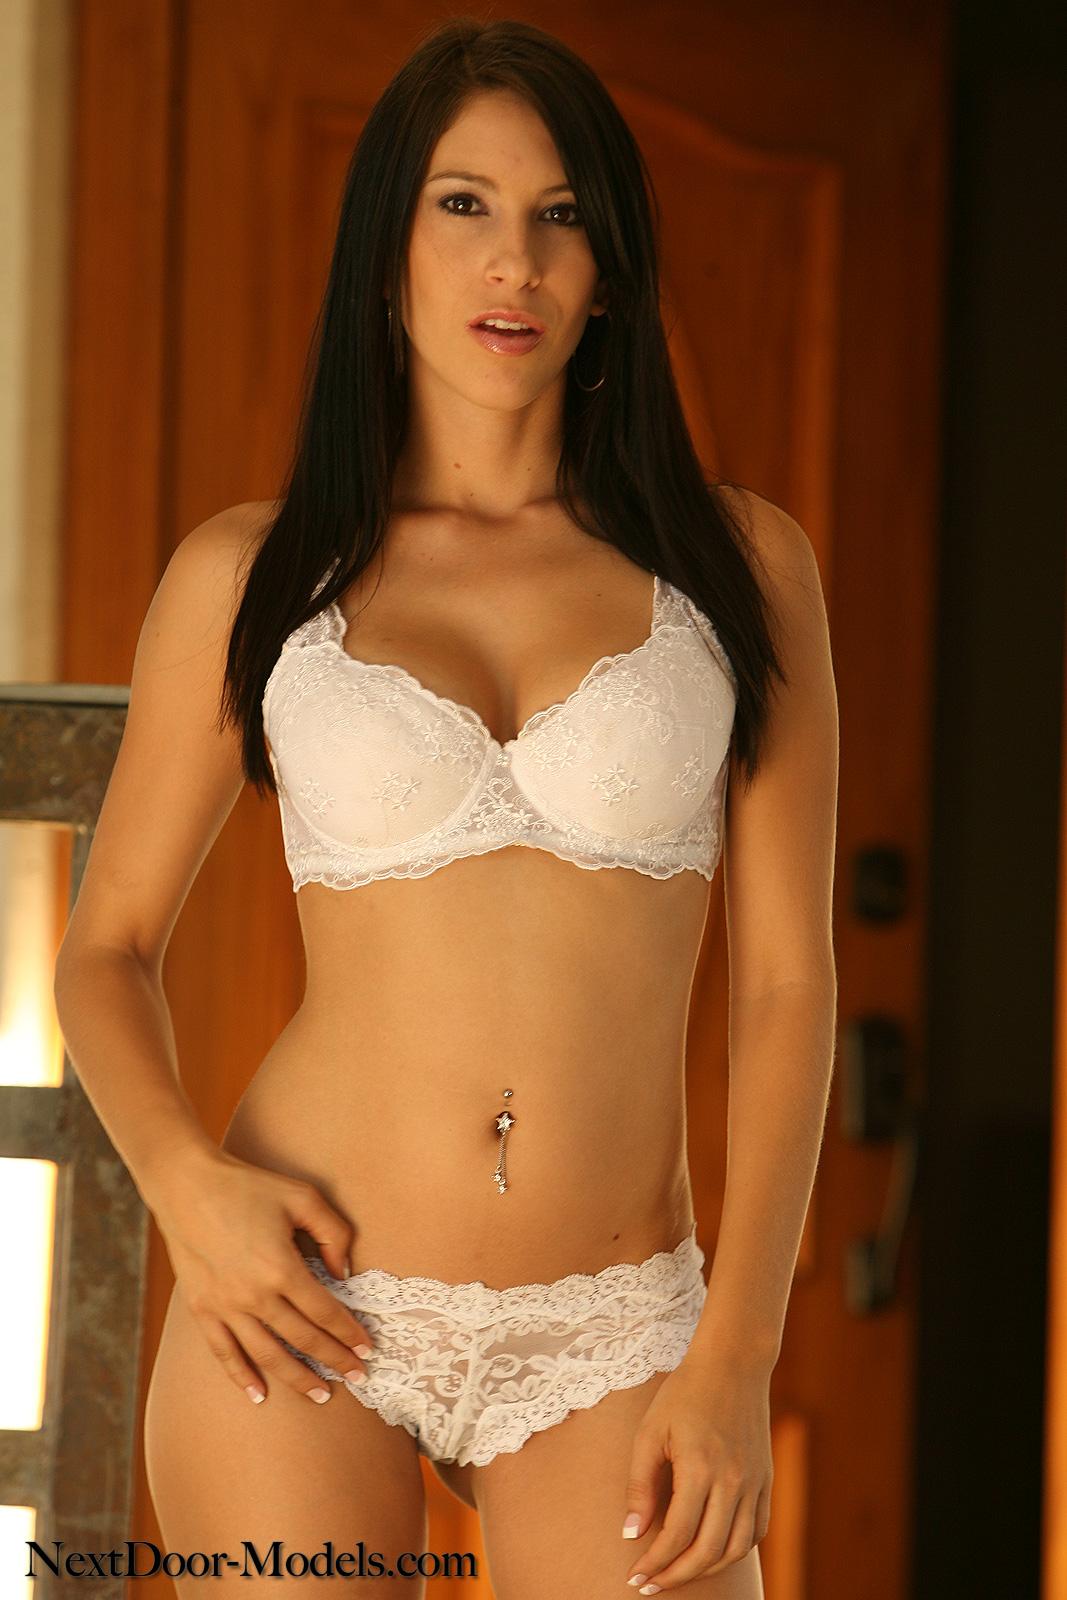 blog spot young girl sex